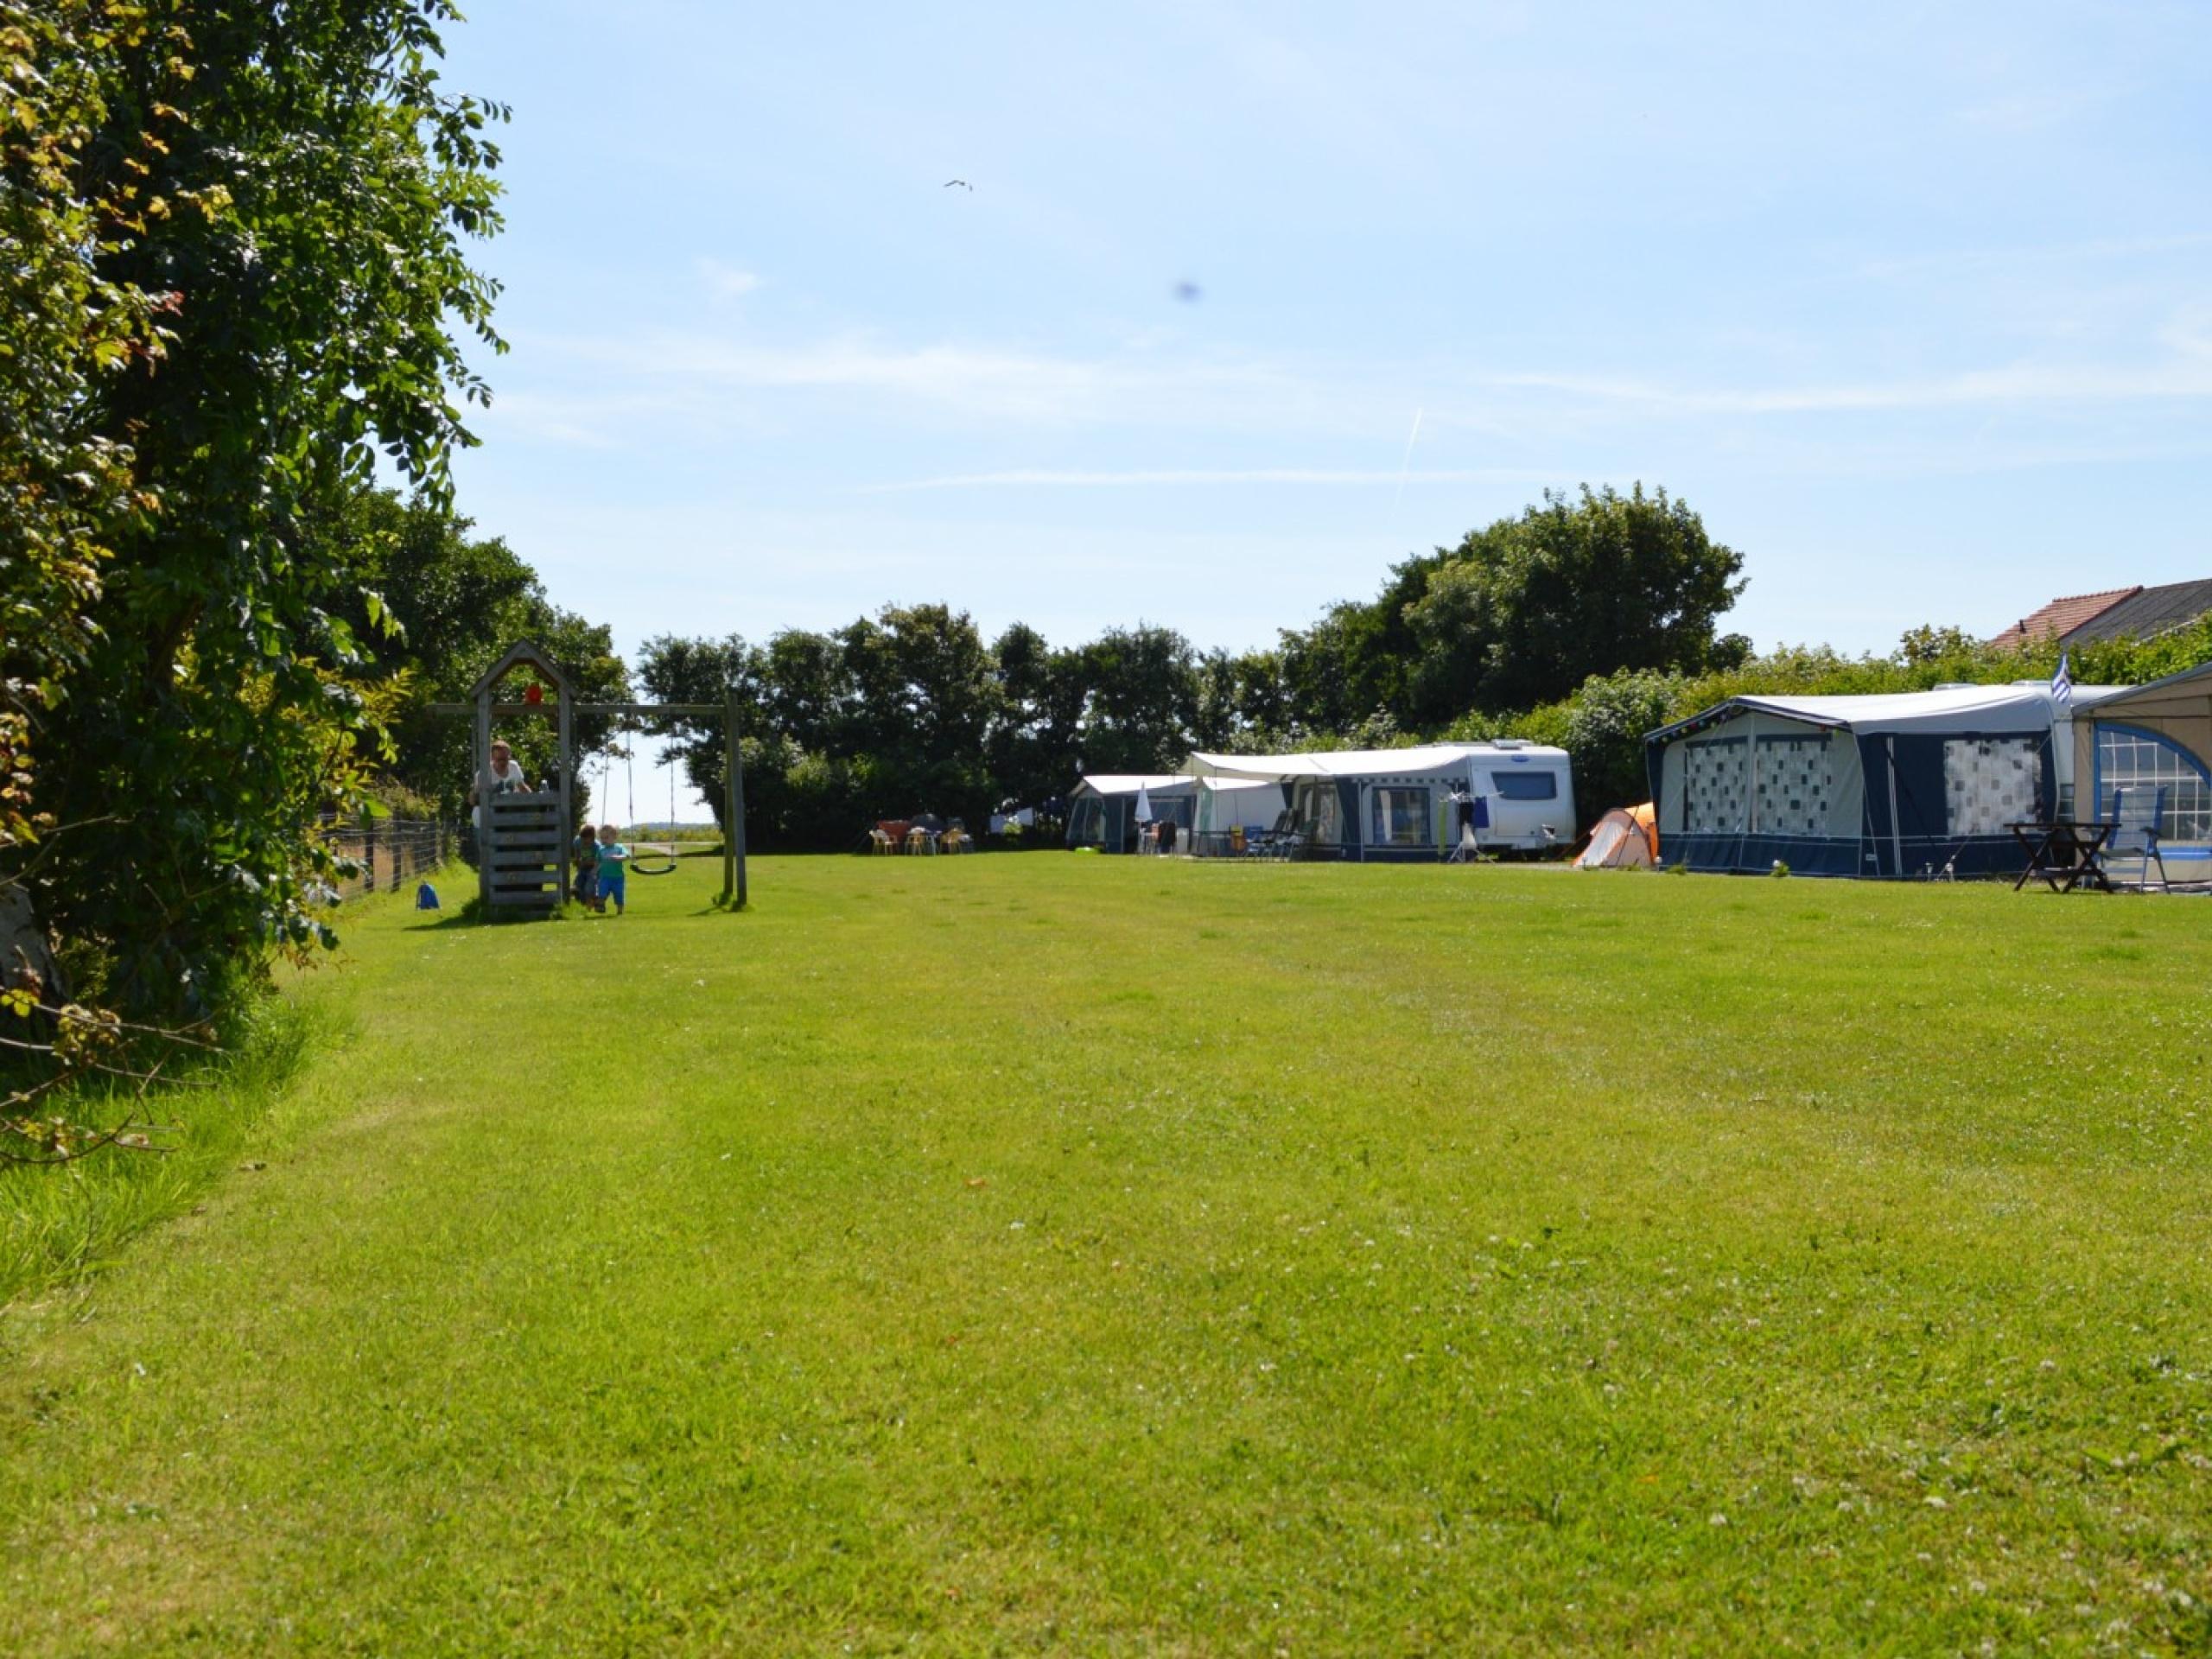 Campen in wunderschöner Lage bei De Slufter nahe De Cocksdorp